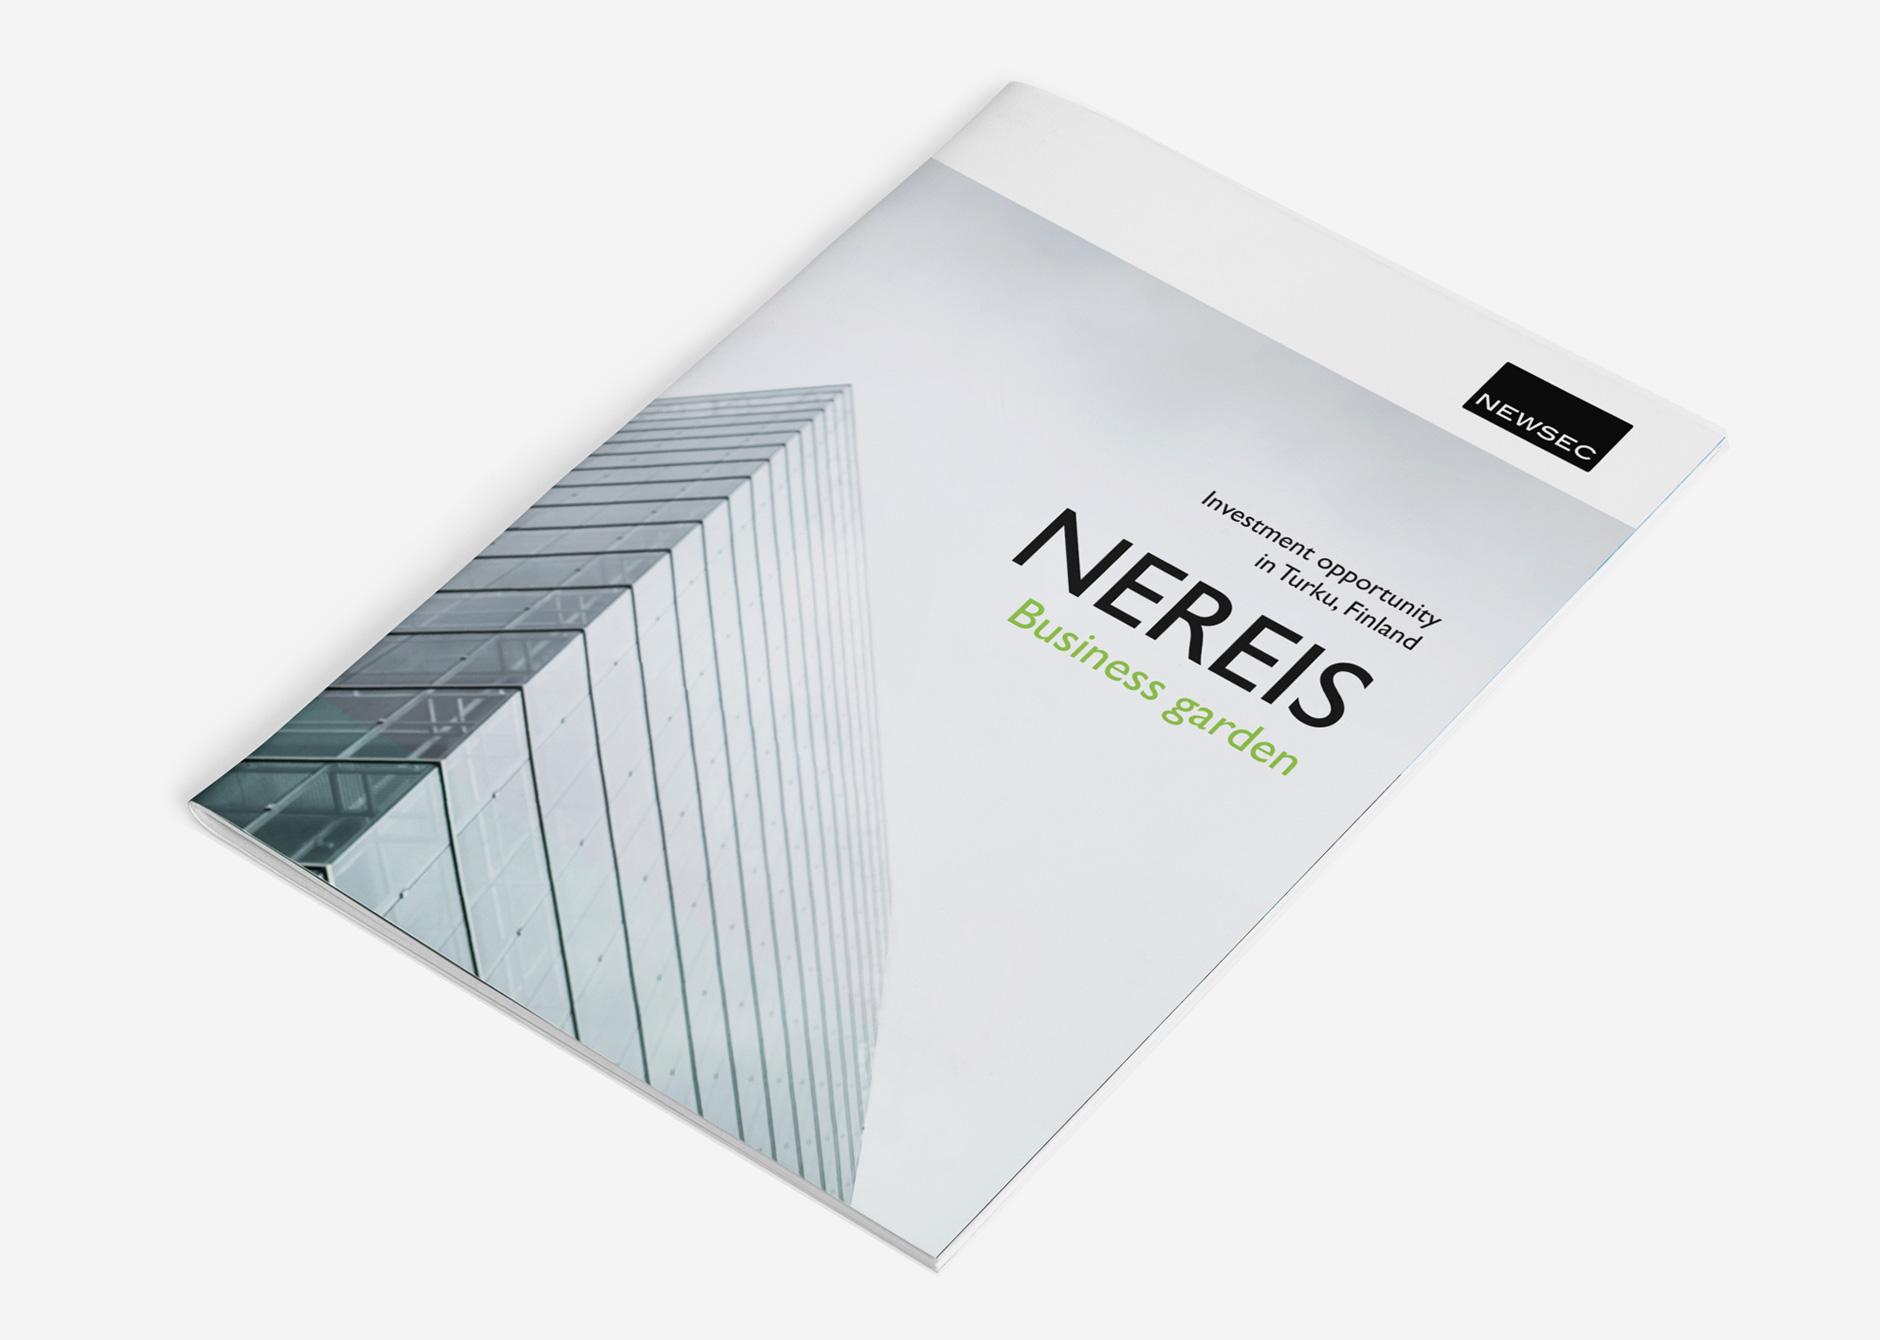 Newsec: Nereis brochure